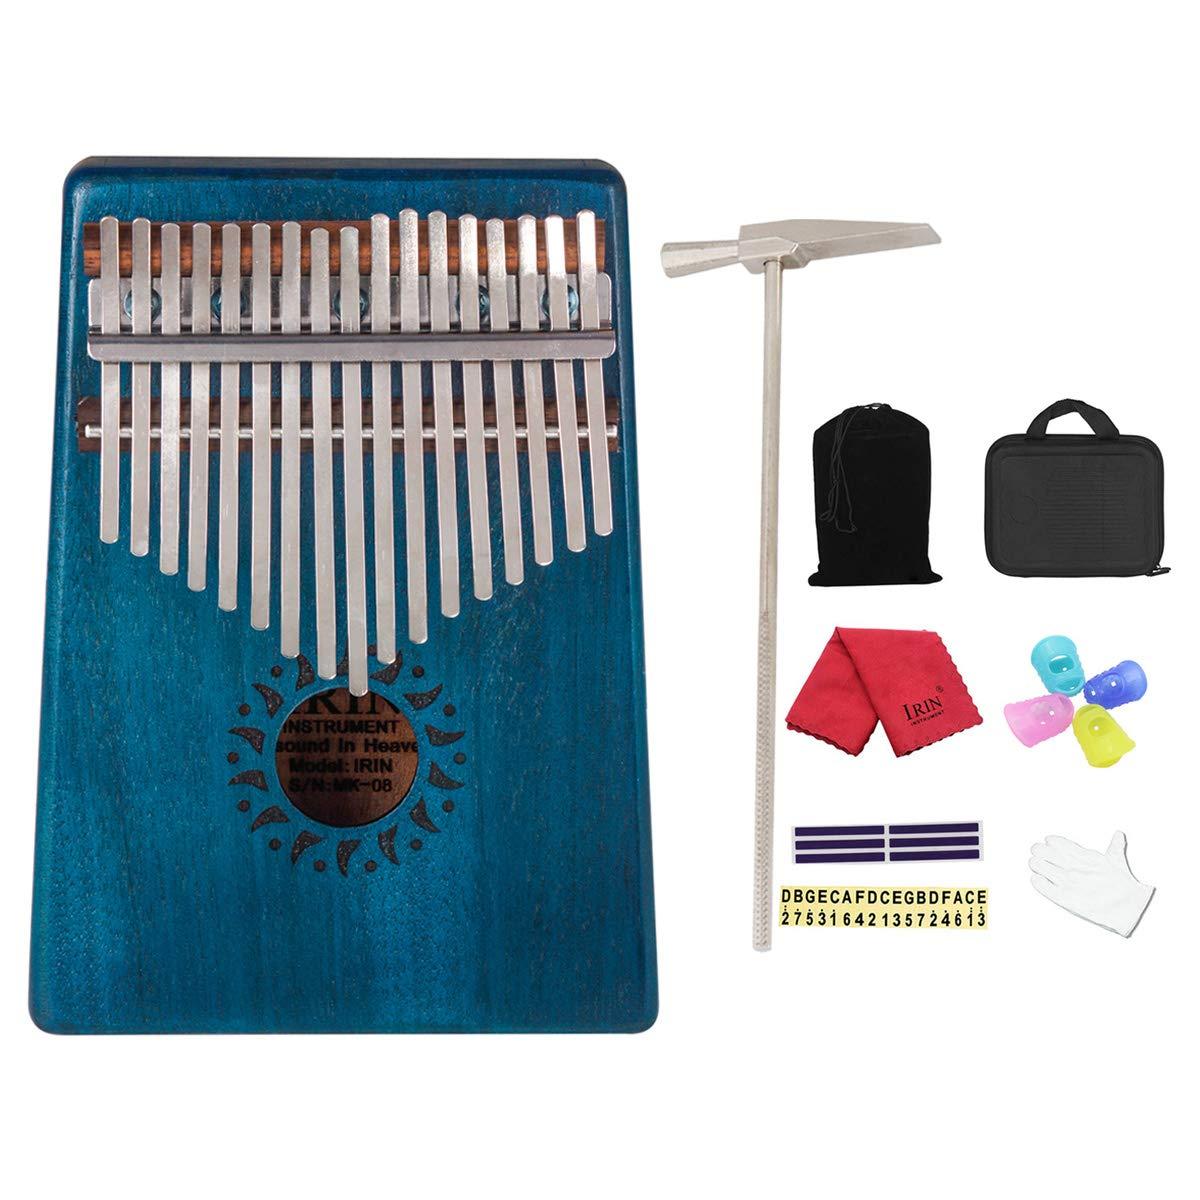 17 KeysKalimba,Mahogany Wood Thumb Piano with Kalimba Protective Case,Tuning Hammer,Carry Bag,Gloves,Finger Stall,Stickers,Cleaning cloth